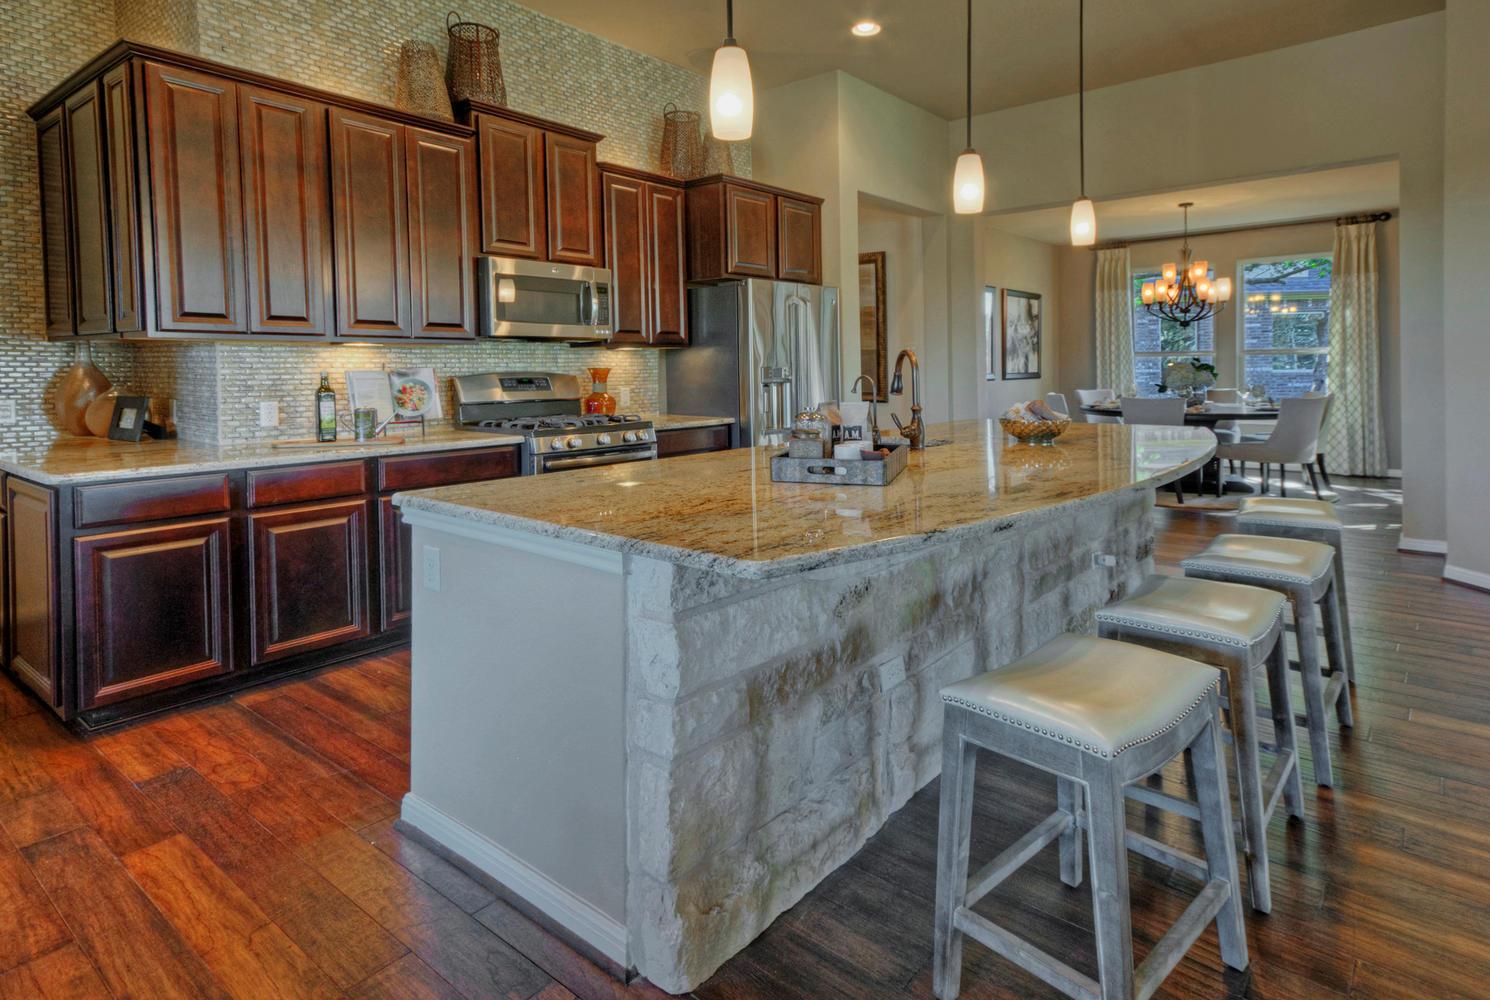 89 new home design center options iklo houston custom home